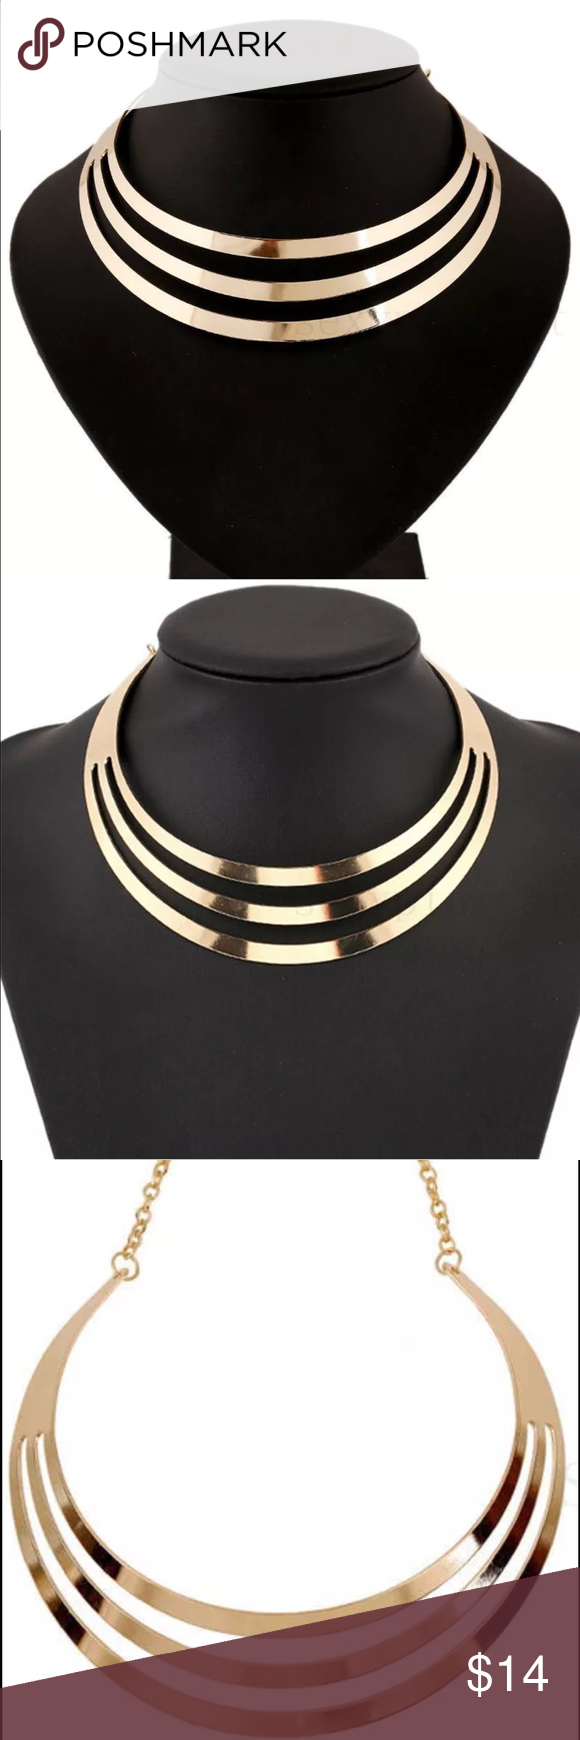 Gold Tone Chocker Statement Necklace Gold Tone Chocker Statement Necklace Jewelry Necklaces